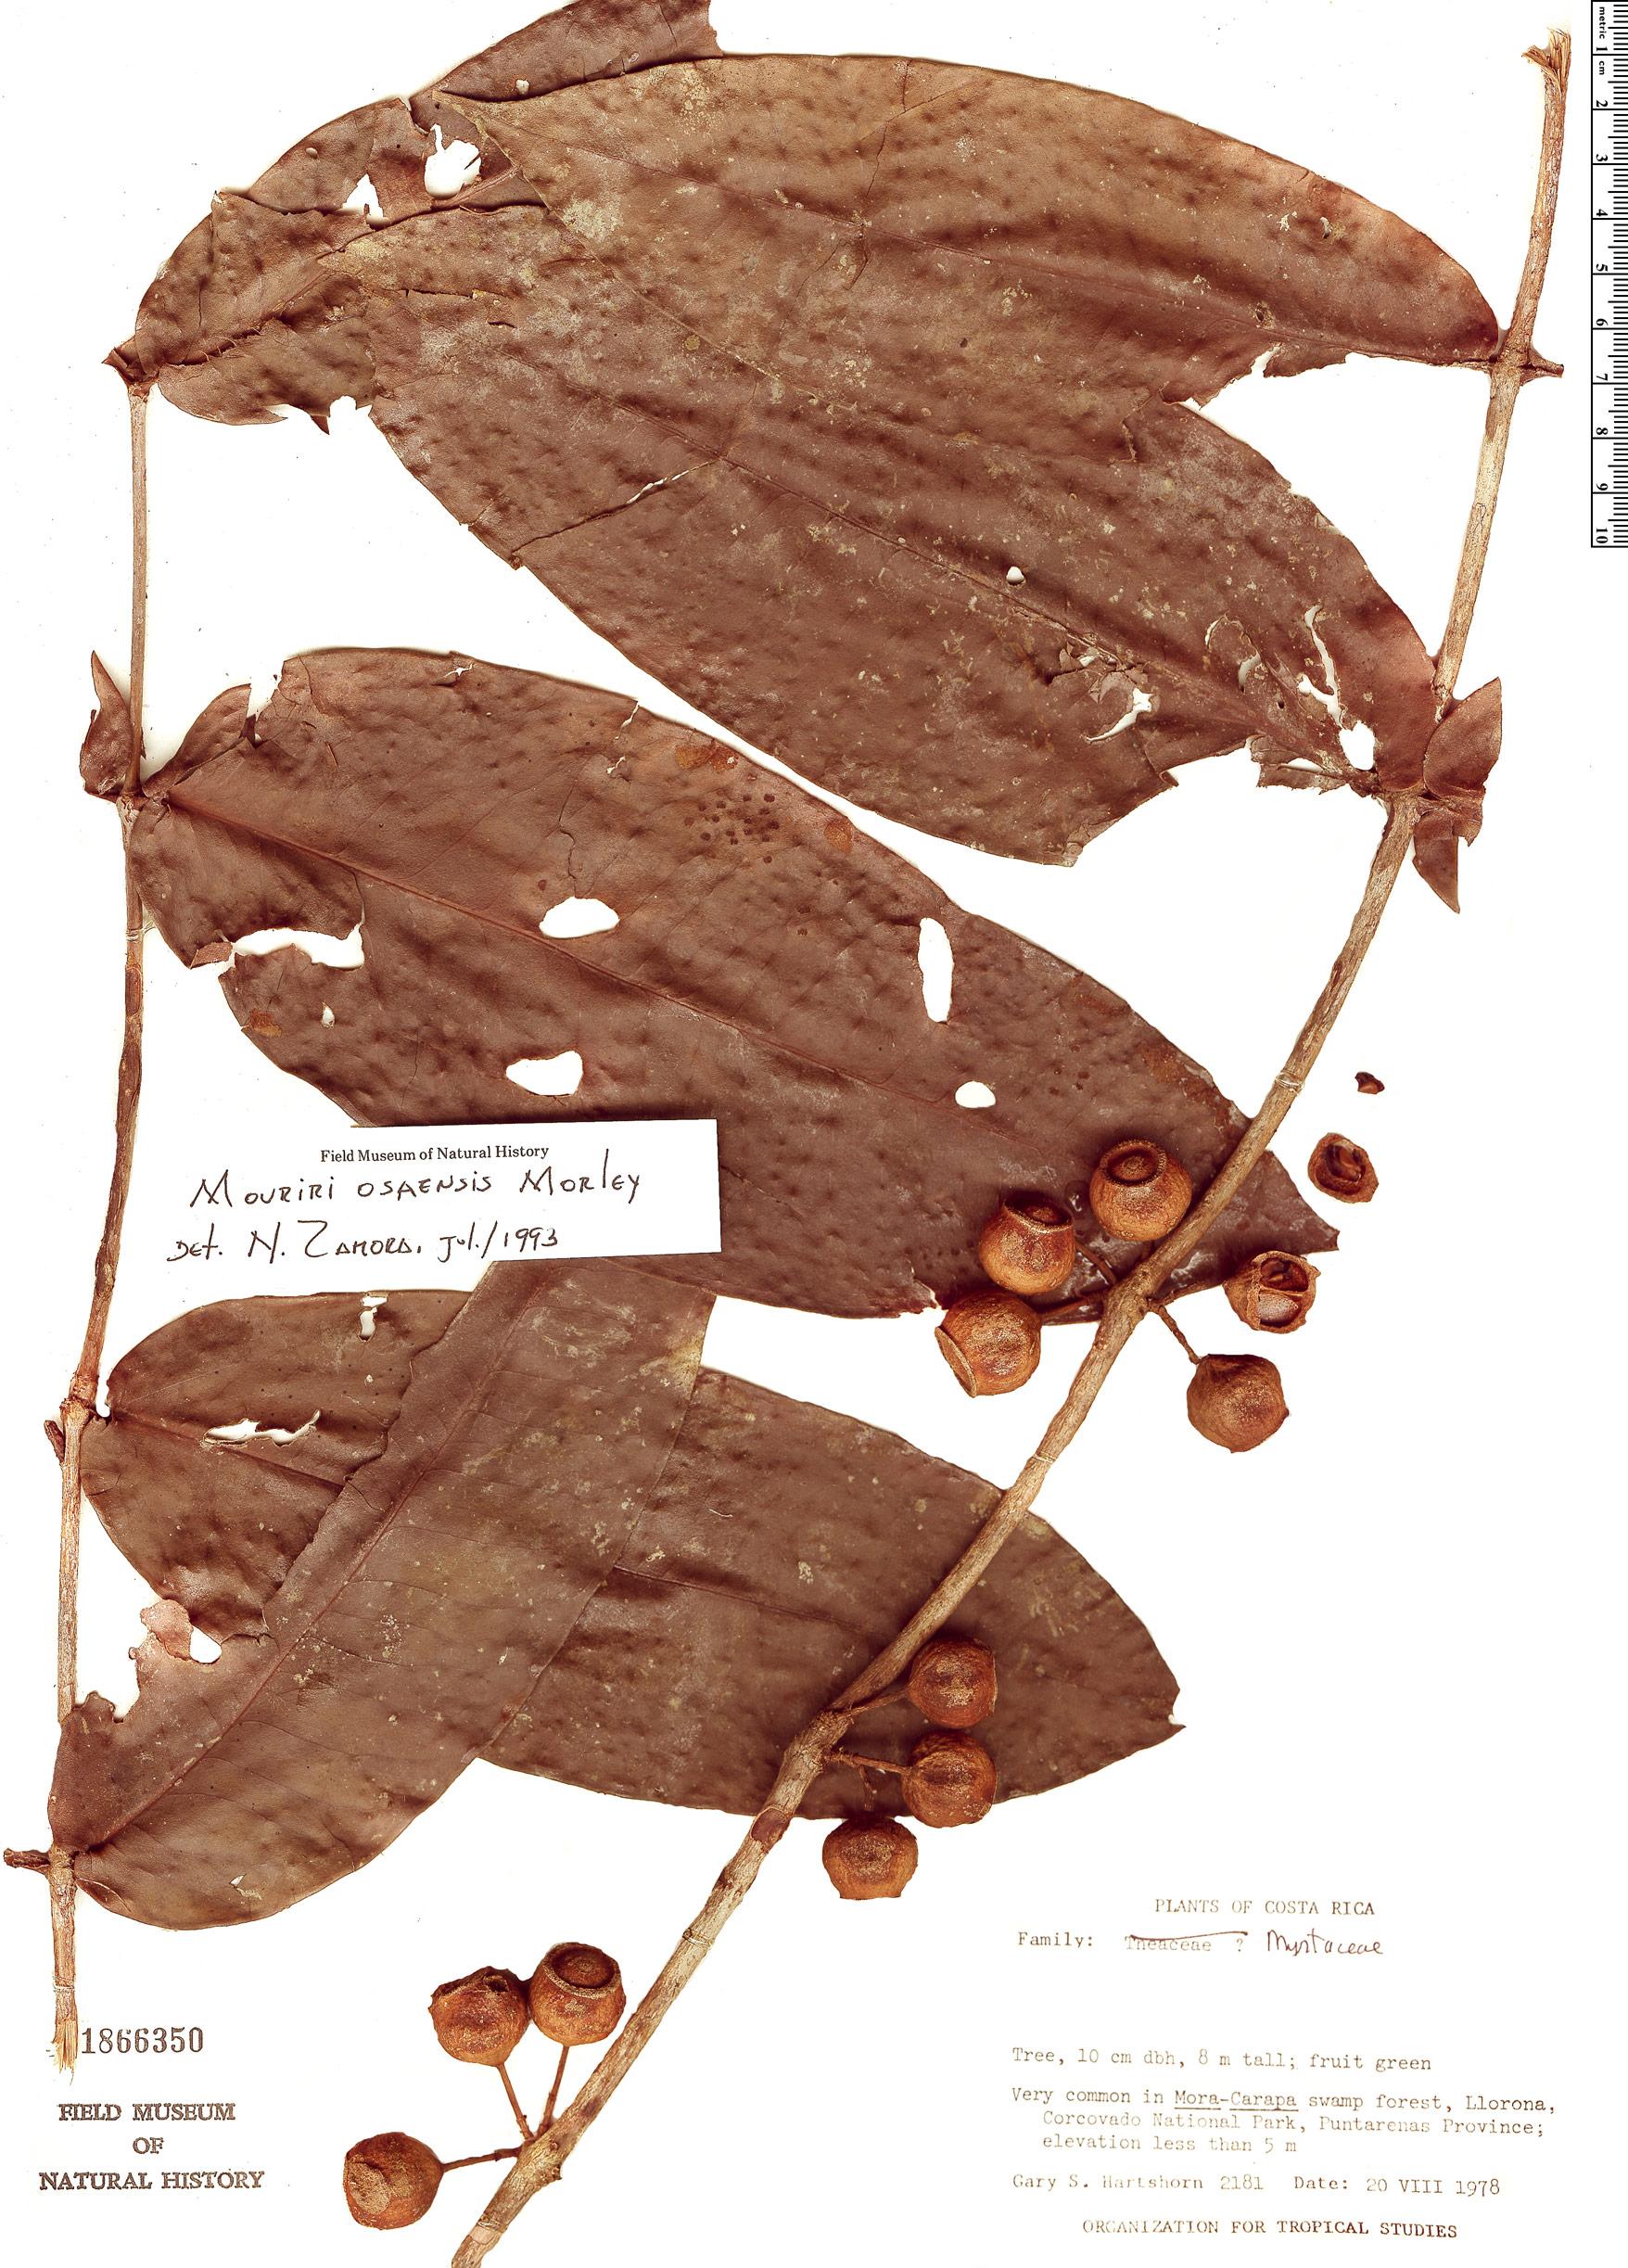 Specimen: Mouriri osaensis